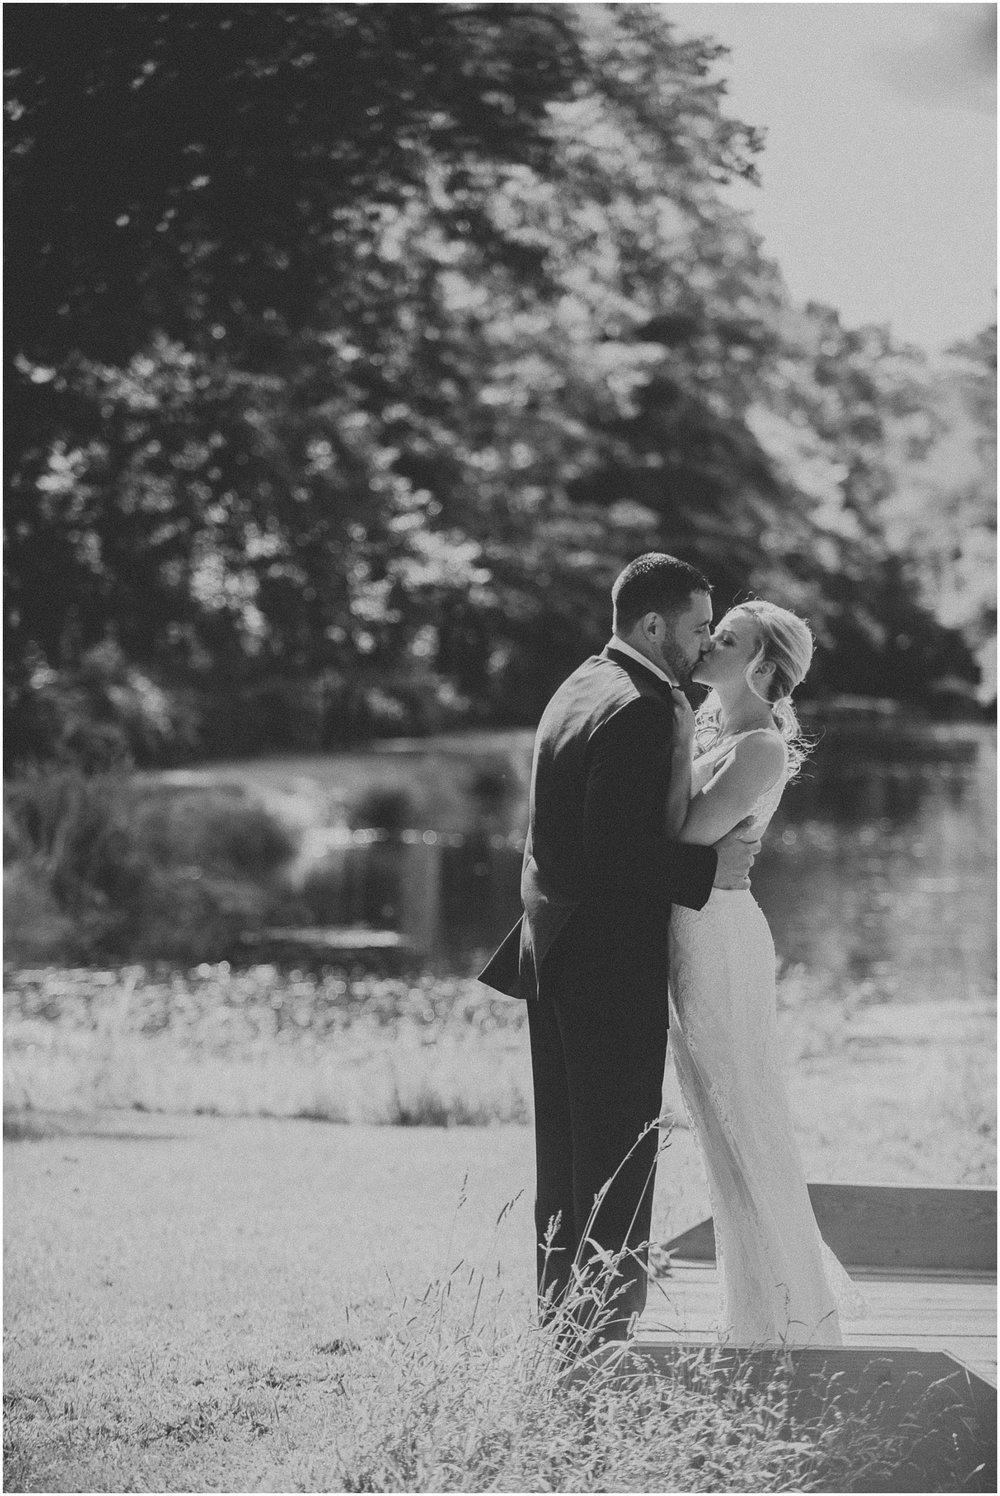 waterloo-village-waterloo village-wedding-outdoor wedding-rustic-boemian-new jersey-bride-groom-wedding party-davids bridal-wedding dress-wedding-first kiss-intimate wedding_0362.jpg